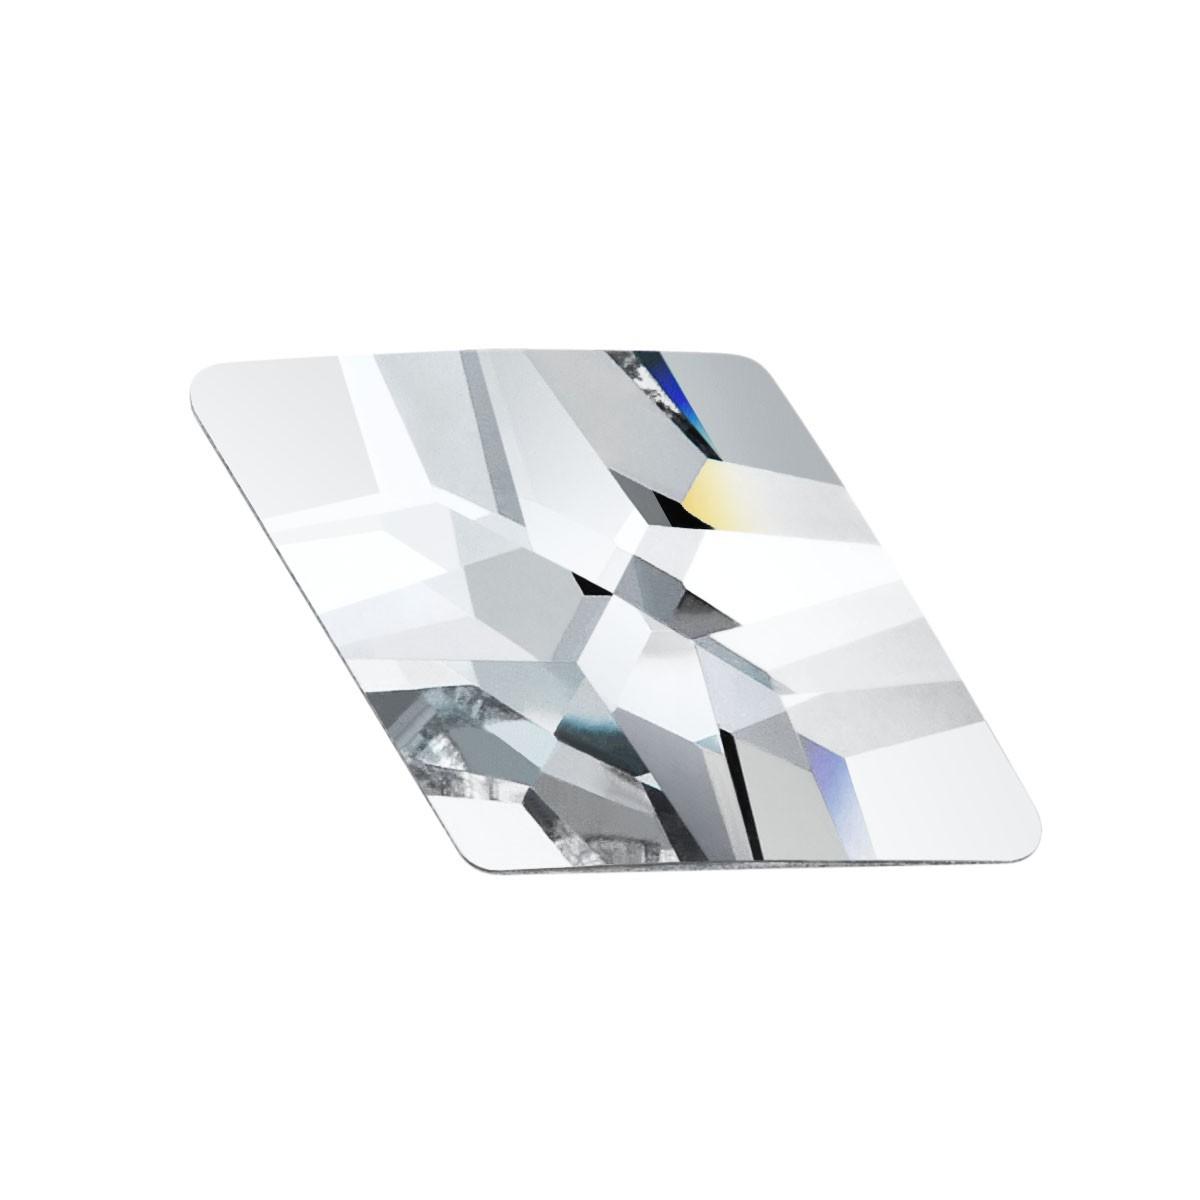 Rhombus Crystal 10 ks 6x4